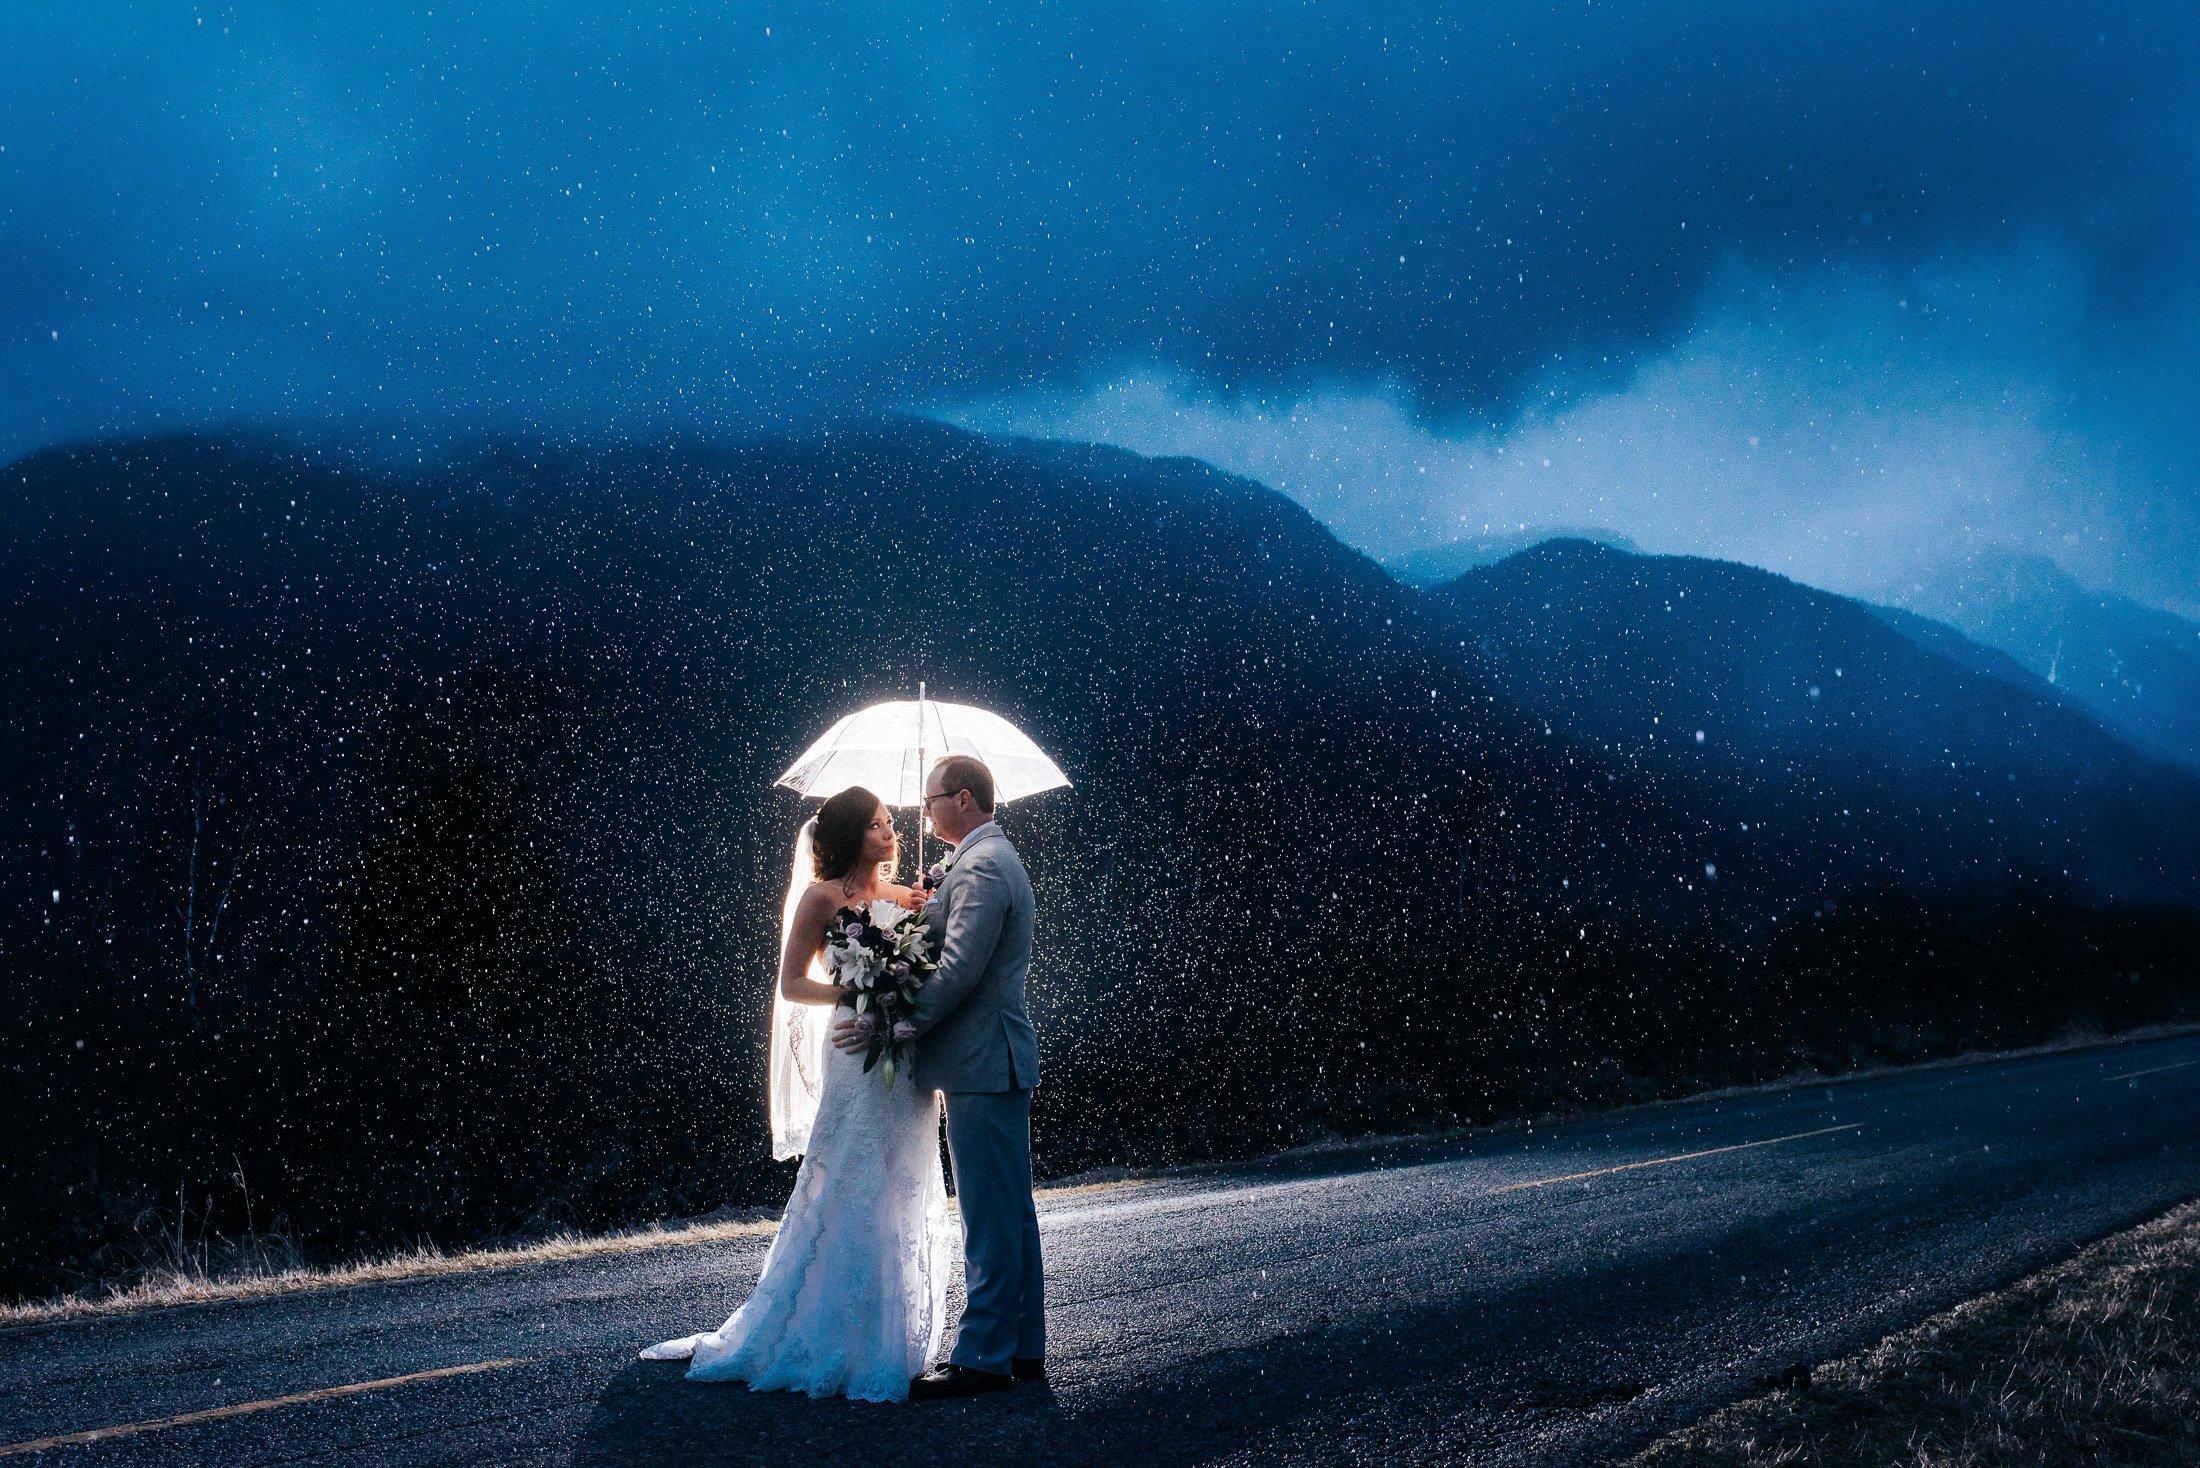 wedding photos in rain